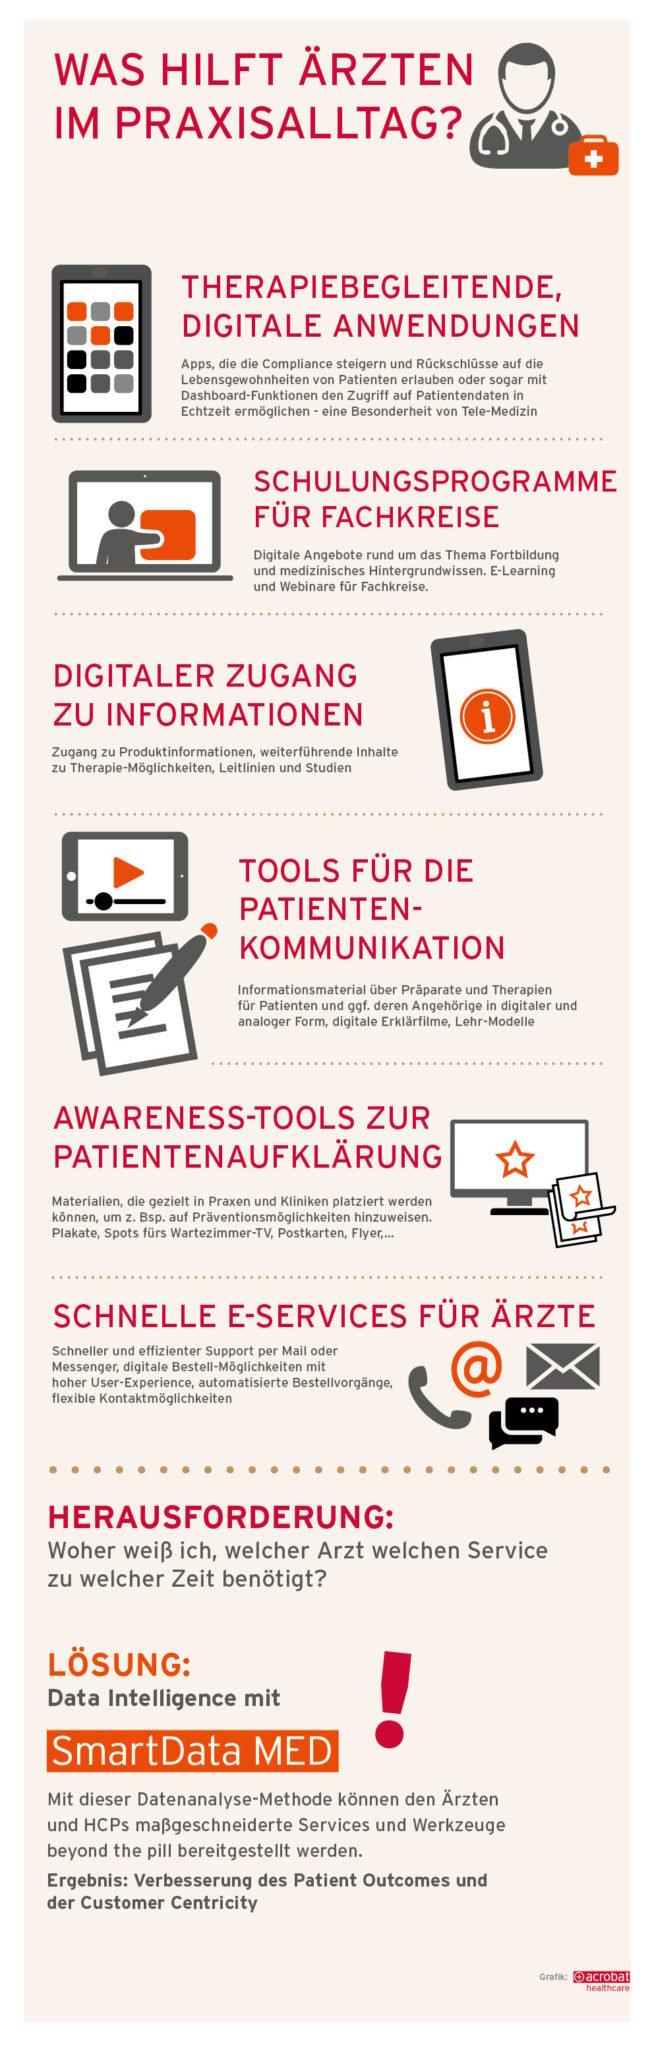 2_acrobat-healthcare-Infografik-SmartDataMed-Beyond-the-pill_PRAXISALLTAG